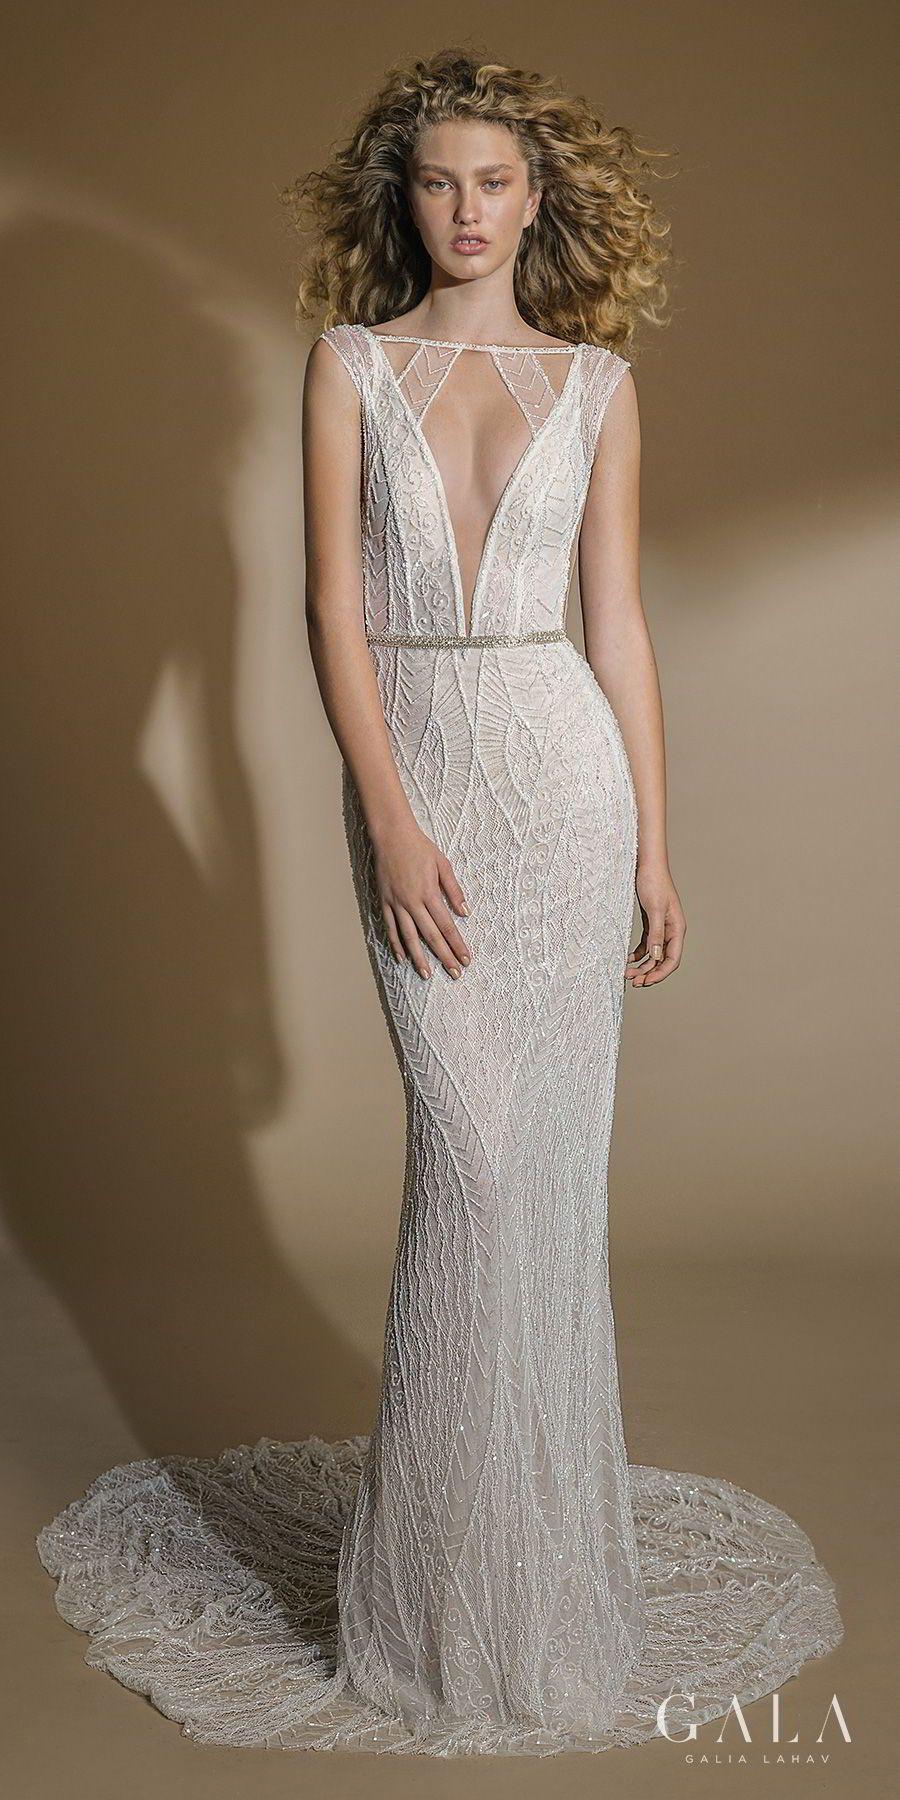 Gala by galia lahav collection no vi u these wedding dresses are